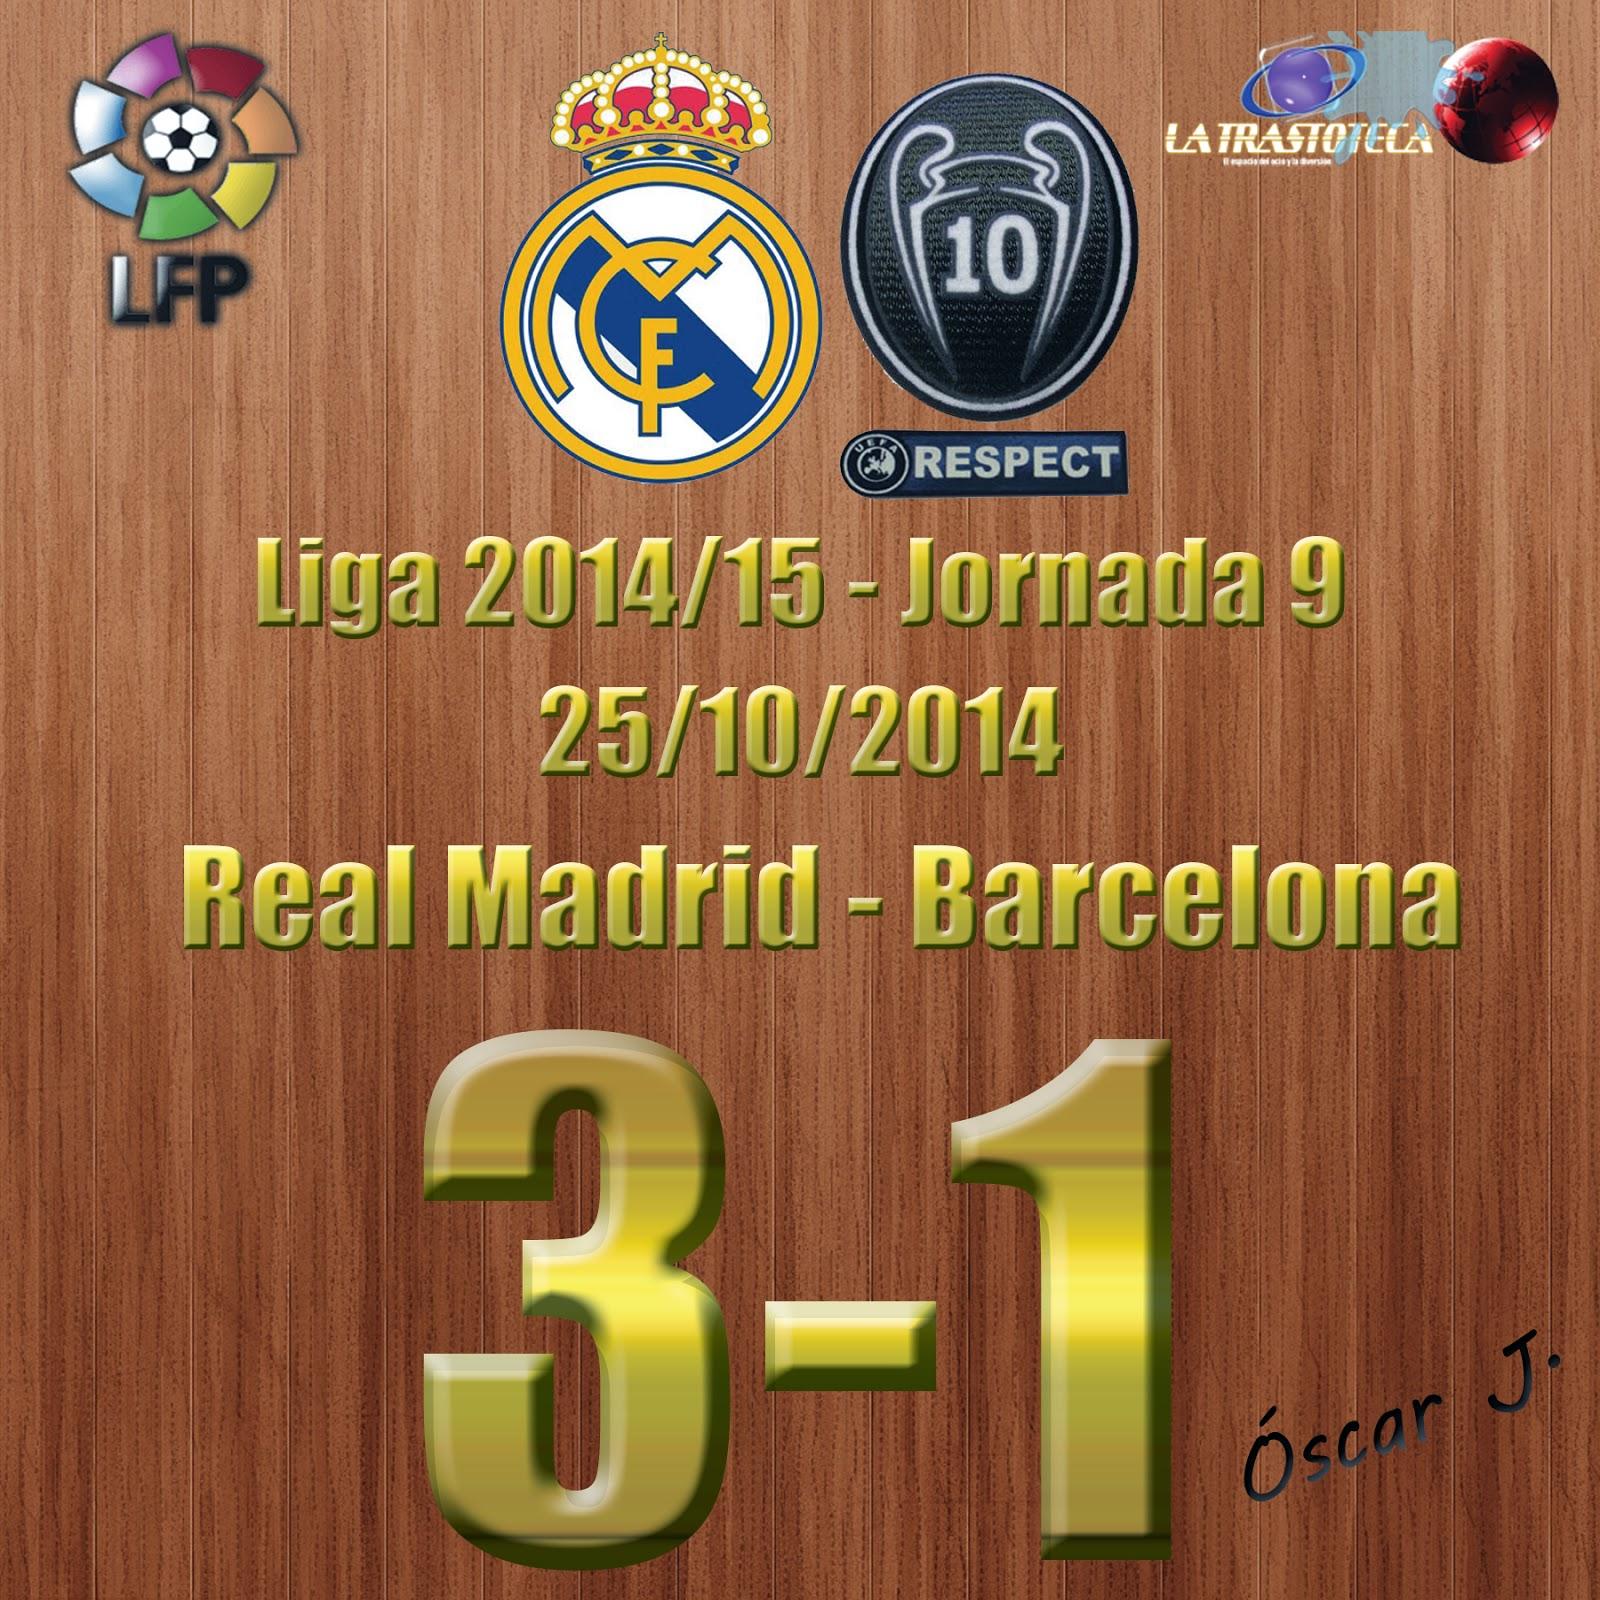 Real Madrid 3-1 Barcelona - Liga 2014/15 - (25/10/2014)